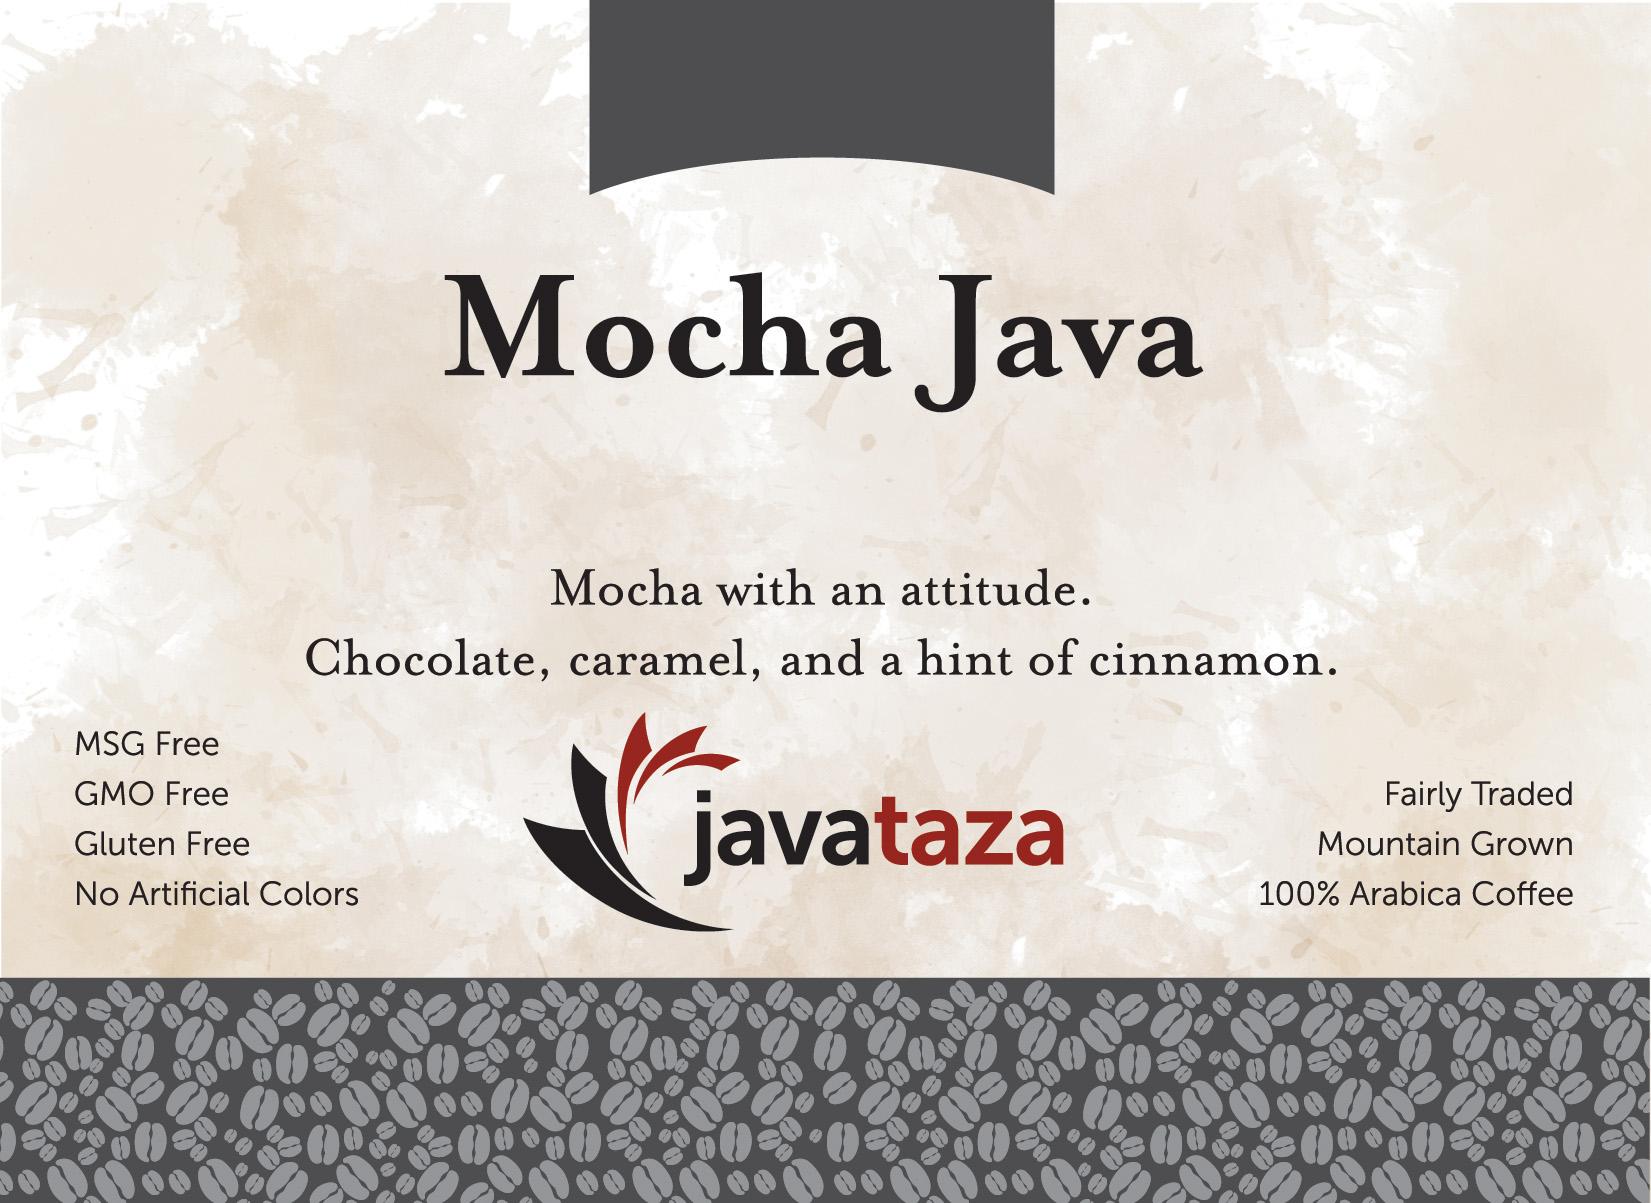 mocha java ground gourmet coffee